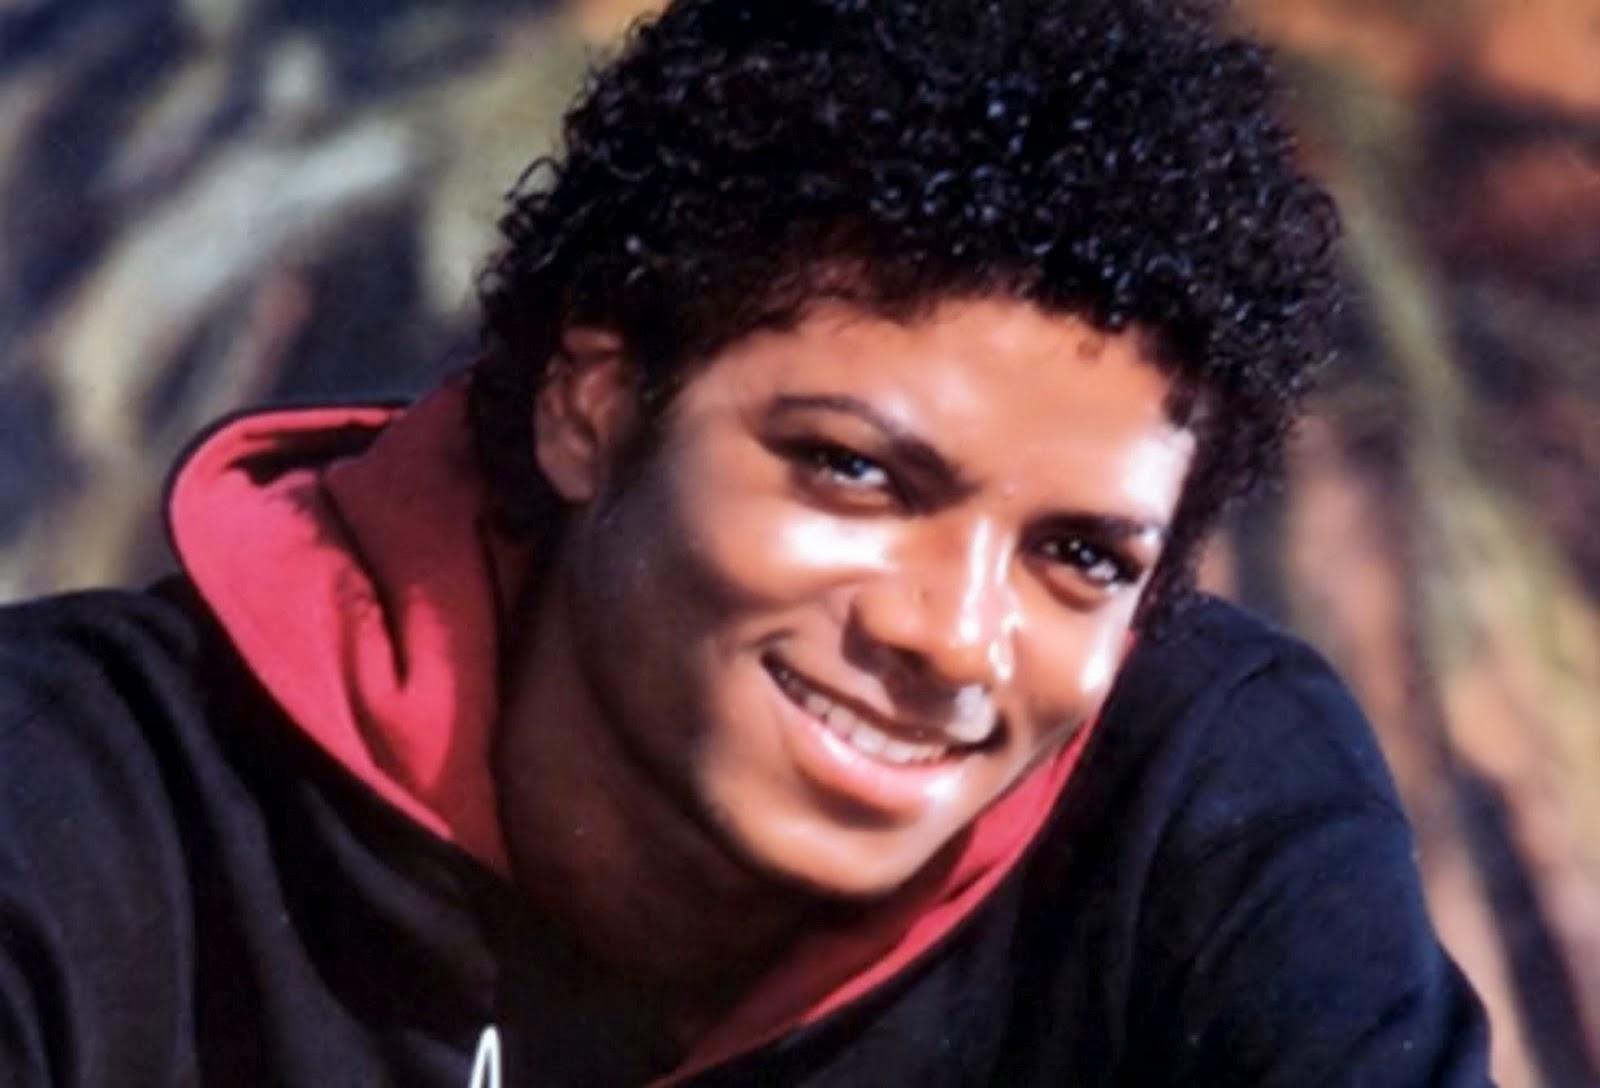 Michael Jackson Mp3 Download - MP3 Download Free